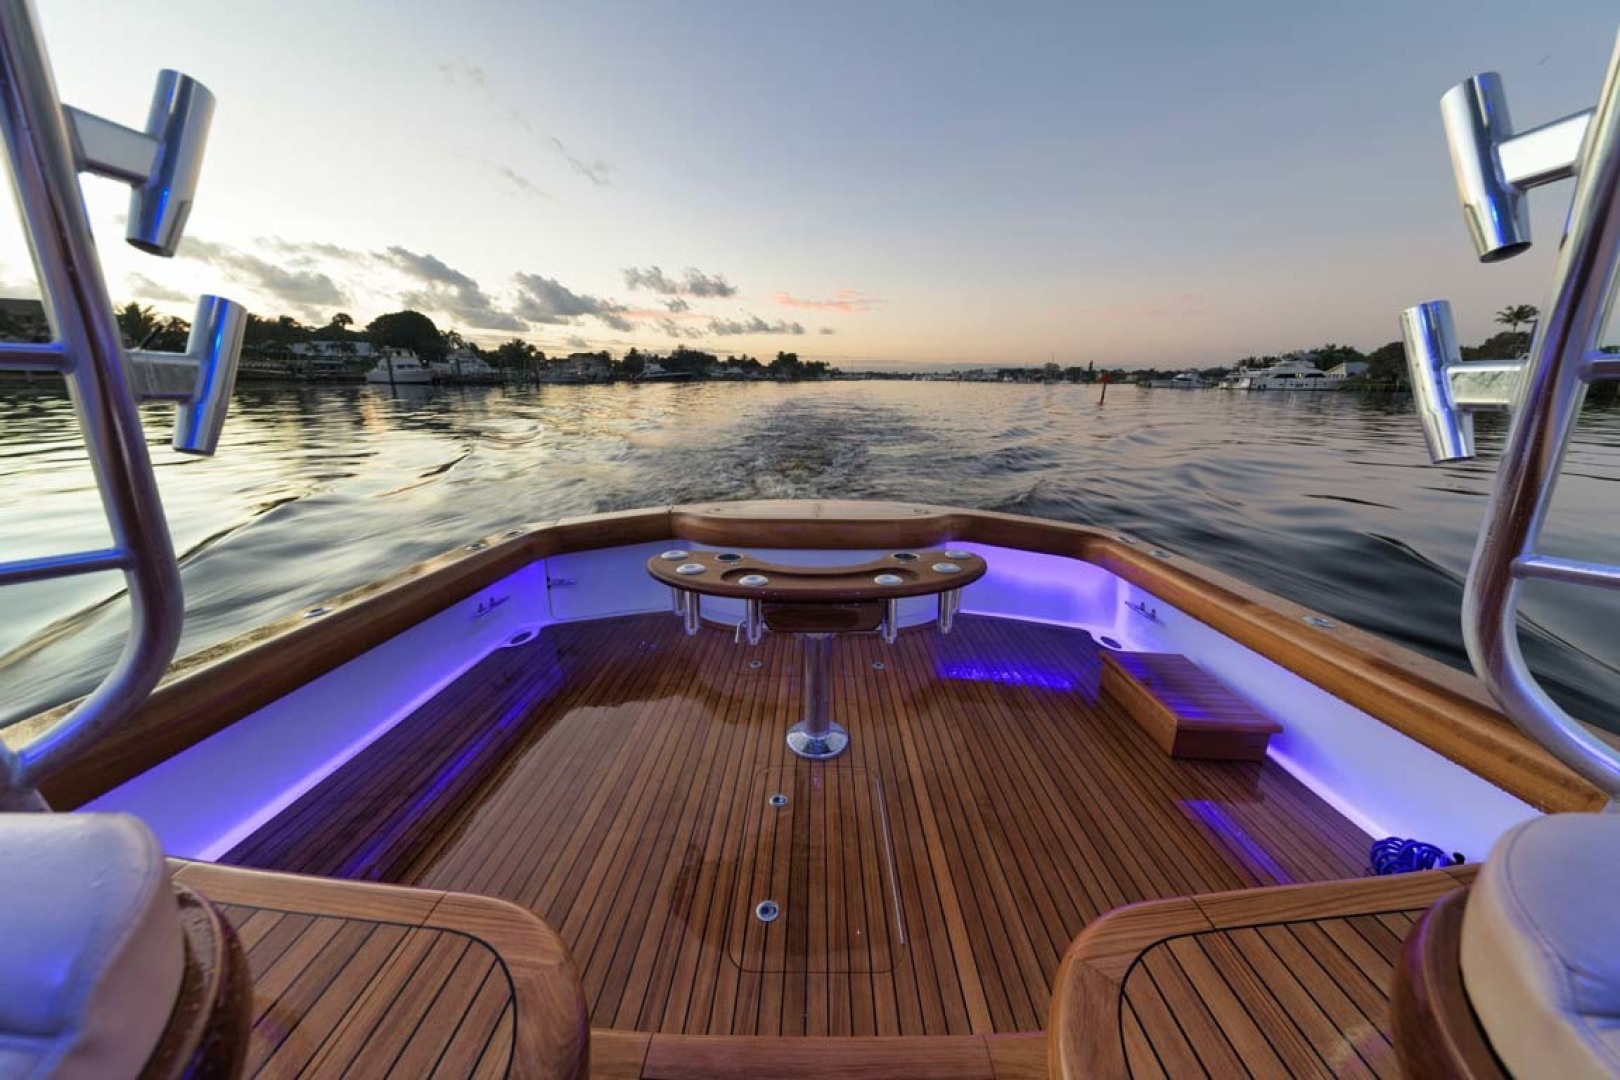 Winter Custom Yachts-46 Walkaround 2019-Family Circus Stuart-Florida-United States-Cockpit with Night Lighting-1563781 | Thumbnail